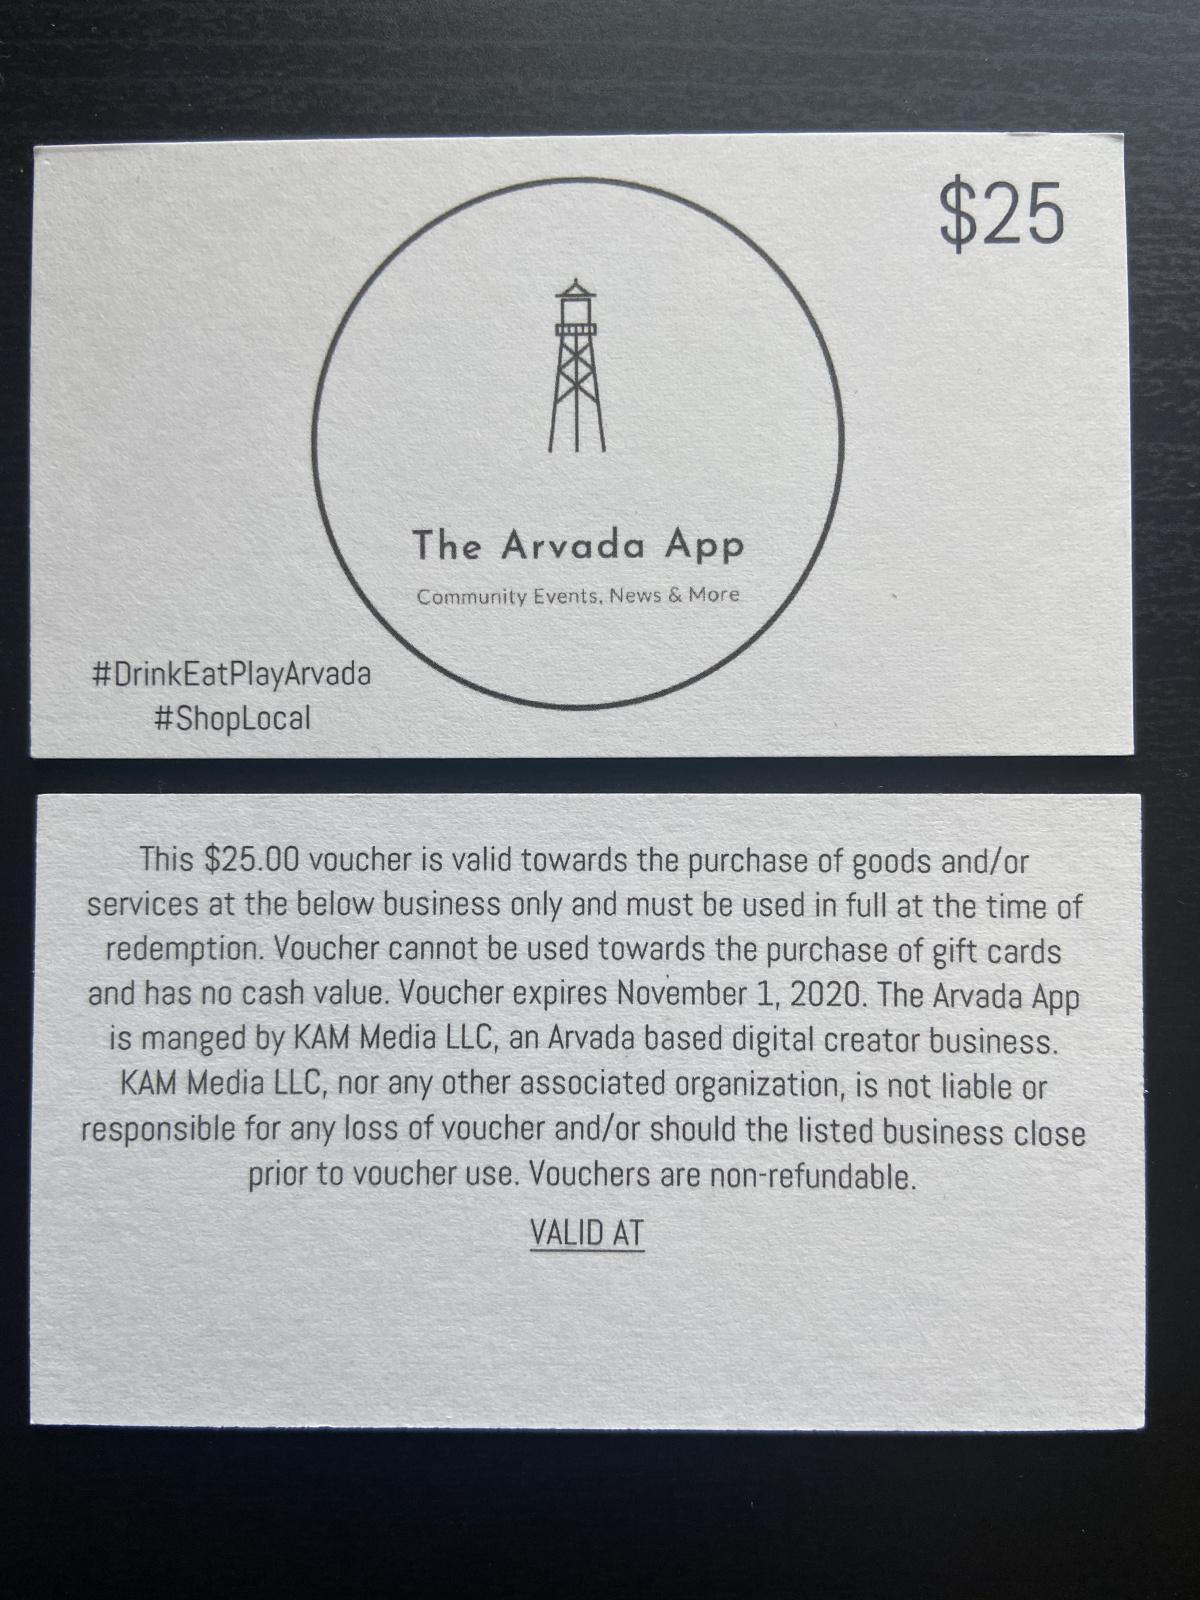 The Arvada App Gift Card, Beers, Restaurants & Online Shopping - All in Arvada #ShopLocal #DrinkEatPlayArvada